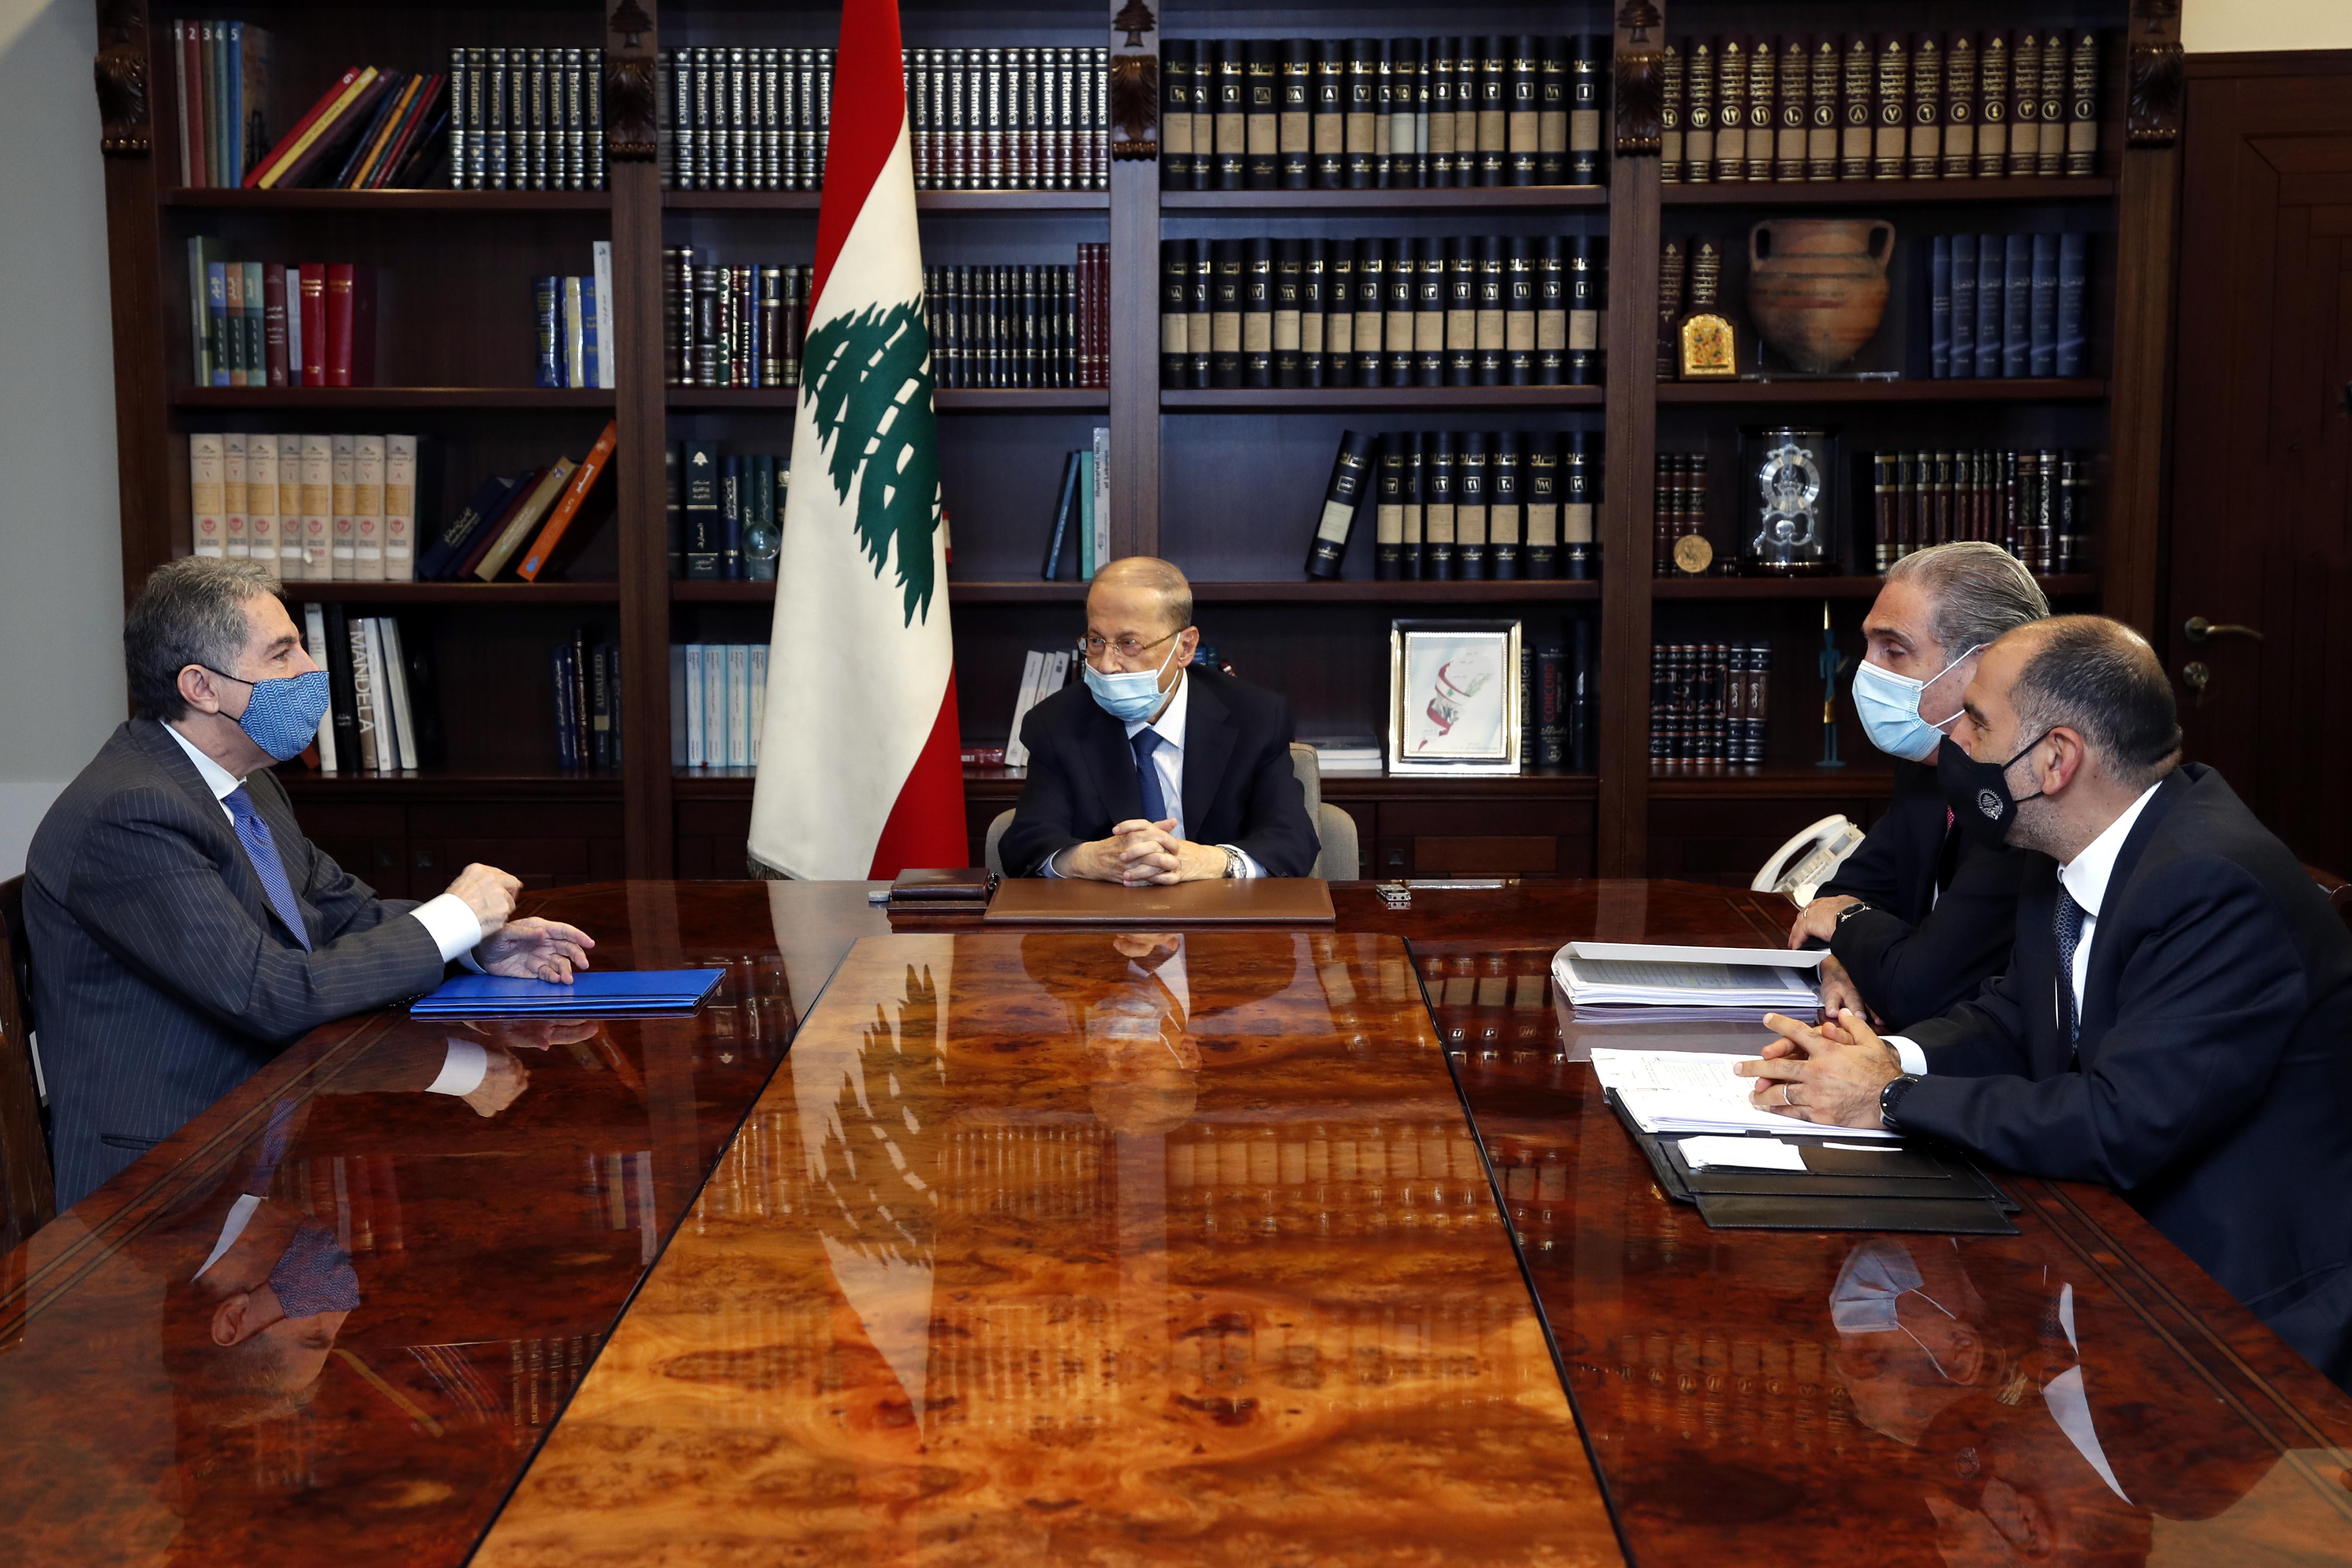 02 - Minister Ghazi Wazni